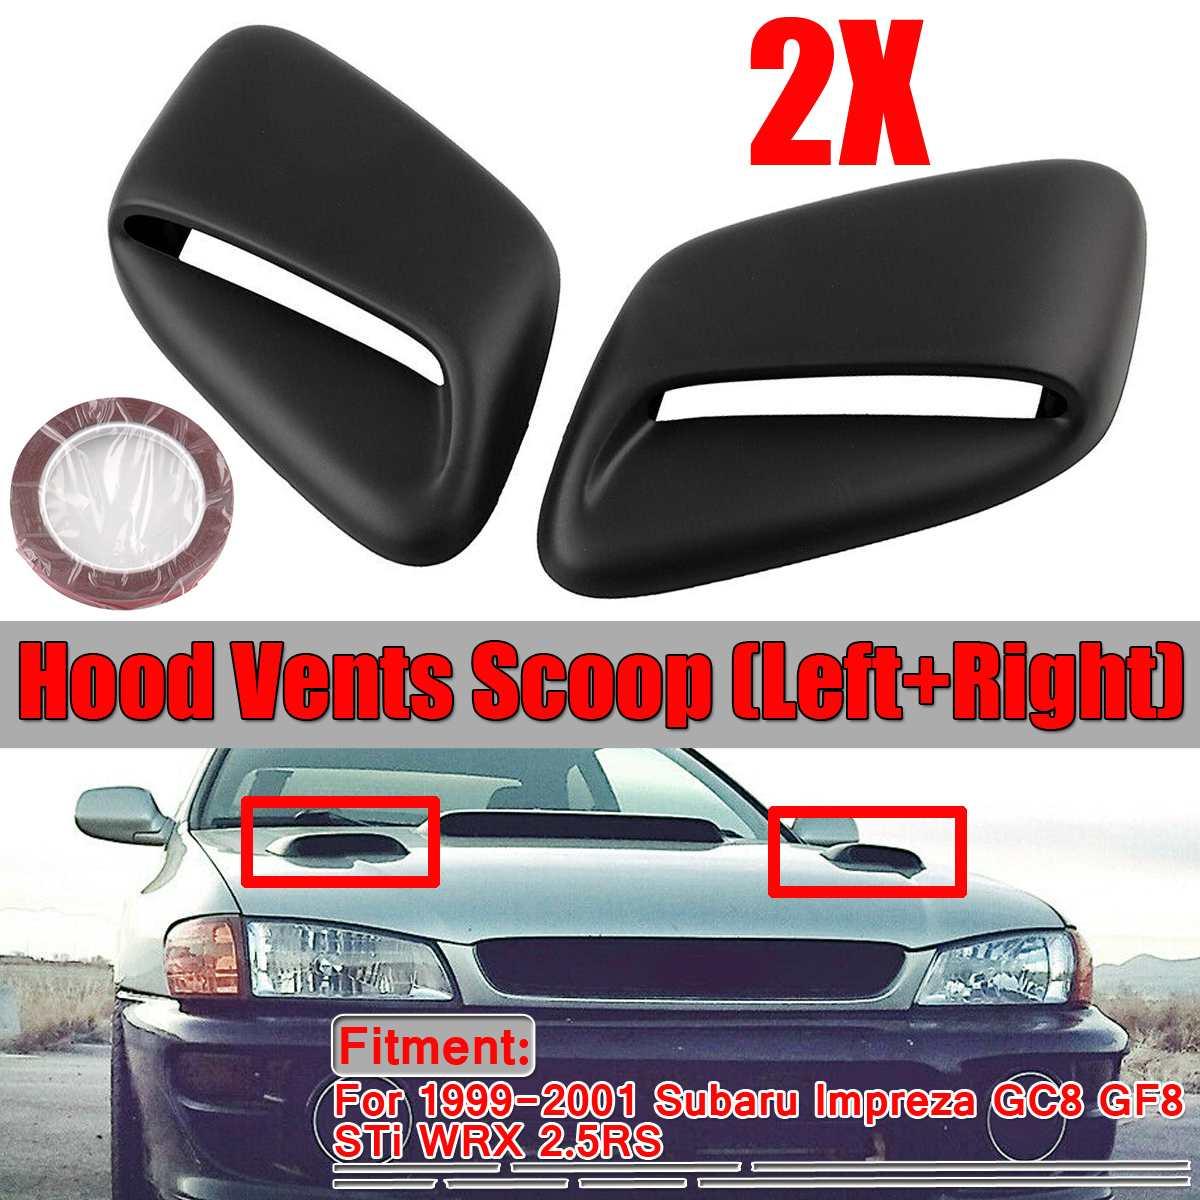 1Pair Black Car Front Air Flow Intake Scoop Hood Vent Bonnet Vents Scoop For Subaru Impreza GC8 GF8 WRX STi 2.5RS 1999 2000 2001 Hoods     - title=